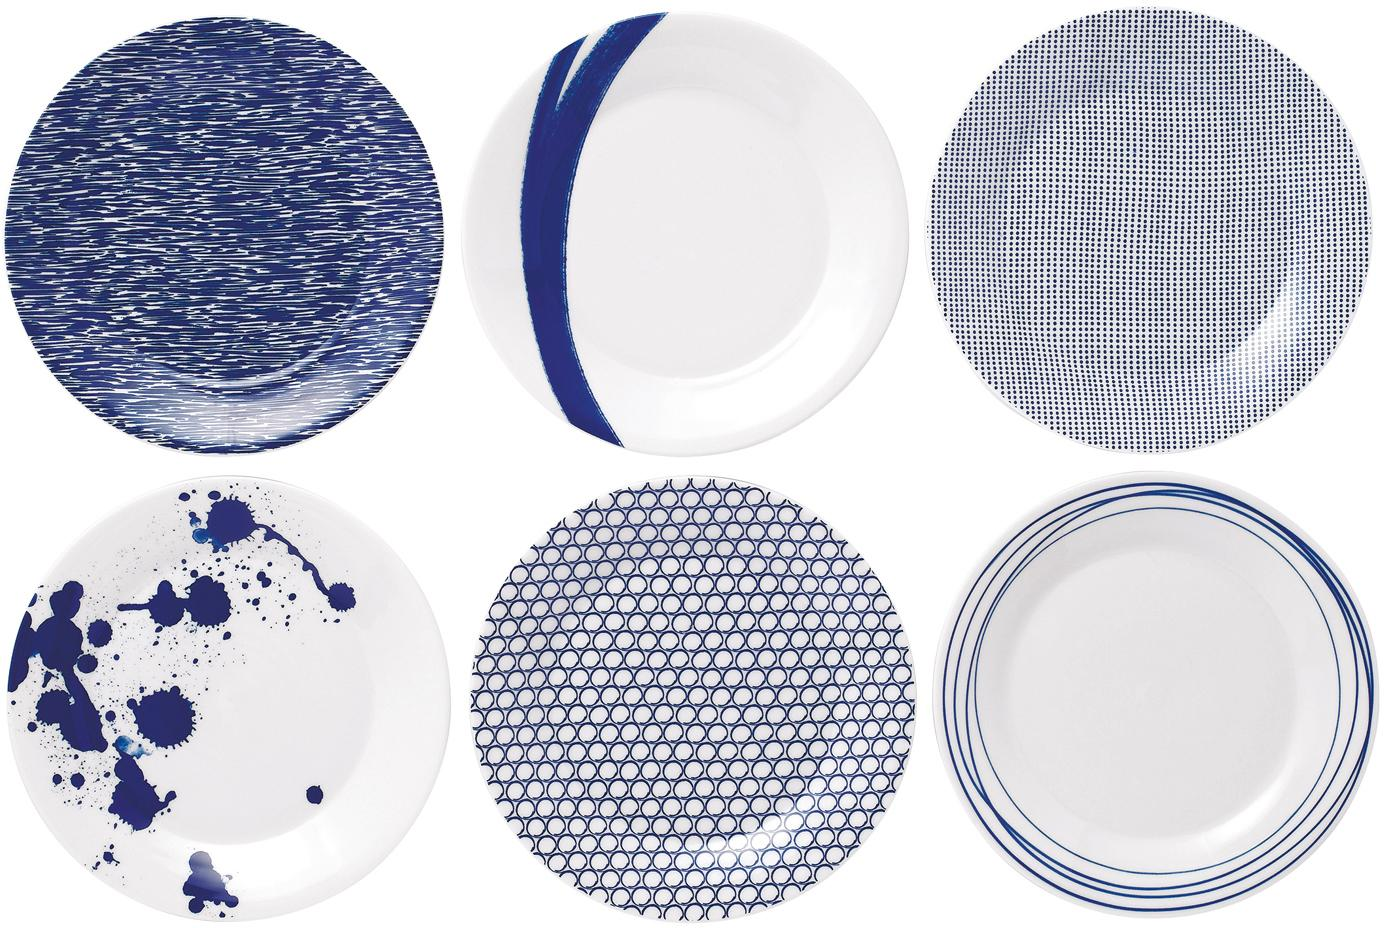 Gemusterte Porzellan-Frühstücksteller Pacific, 6er-Set, Porzellan, Weiß, Blau, Ø 23 cm